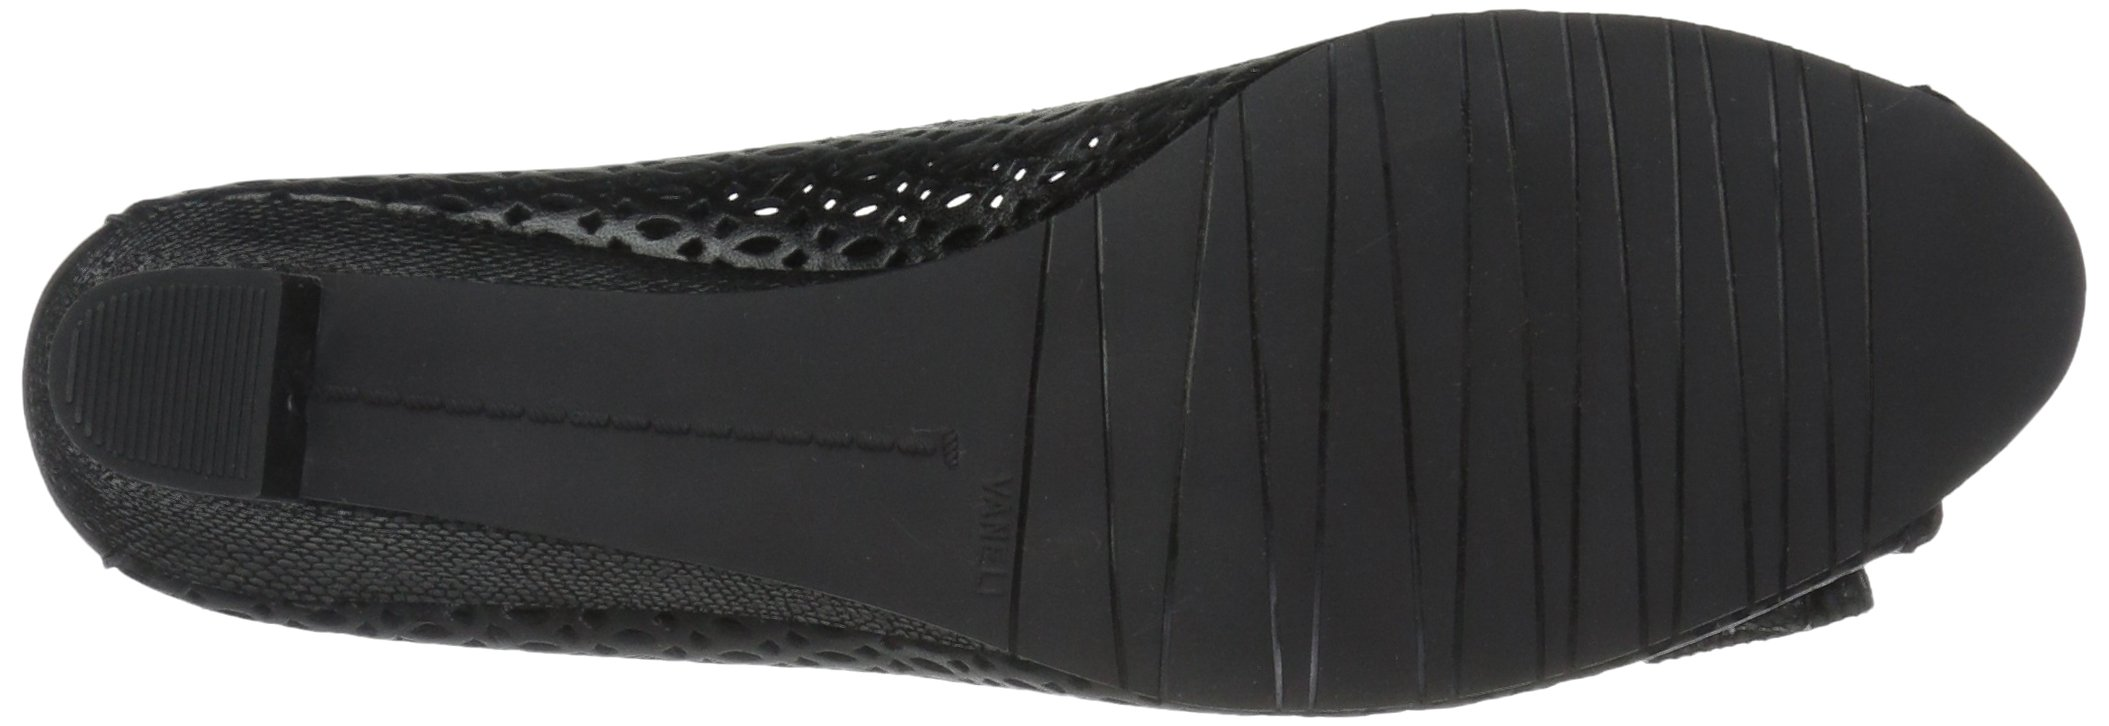 VANELi Women's Brinly Wedge Sandal, Black Perfed Nappa/Black Summer VIP, 9.5 N US by VANELi (Image #3)